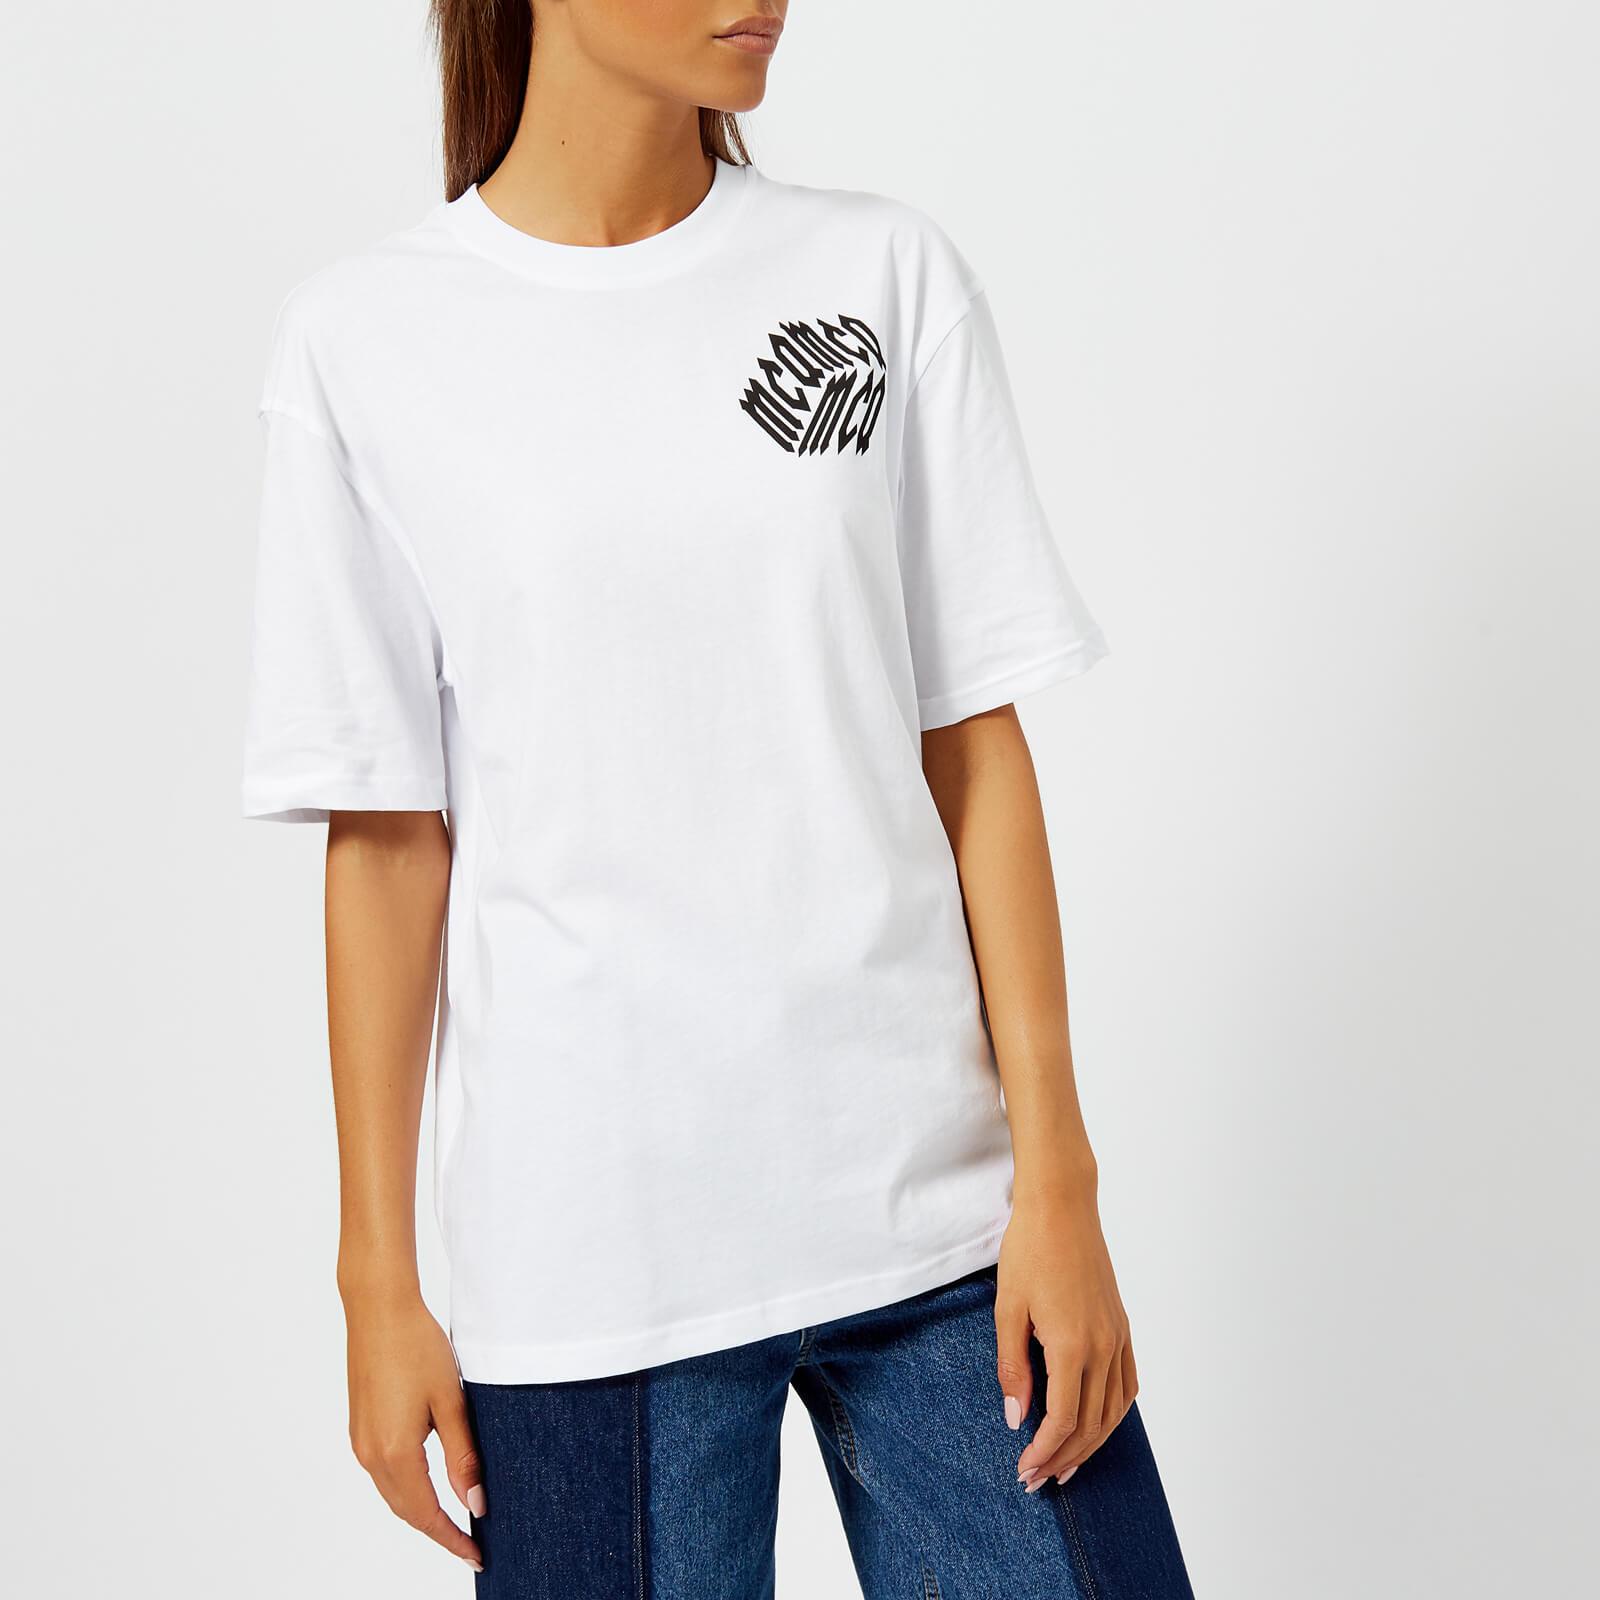 06e99bfb McQ Alexander McQueen Women's Boyfriend T-Shirt - Optic White - Free UK  Delivery over £50